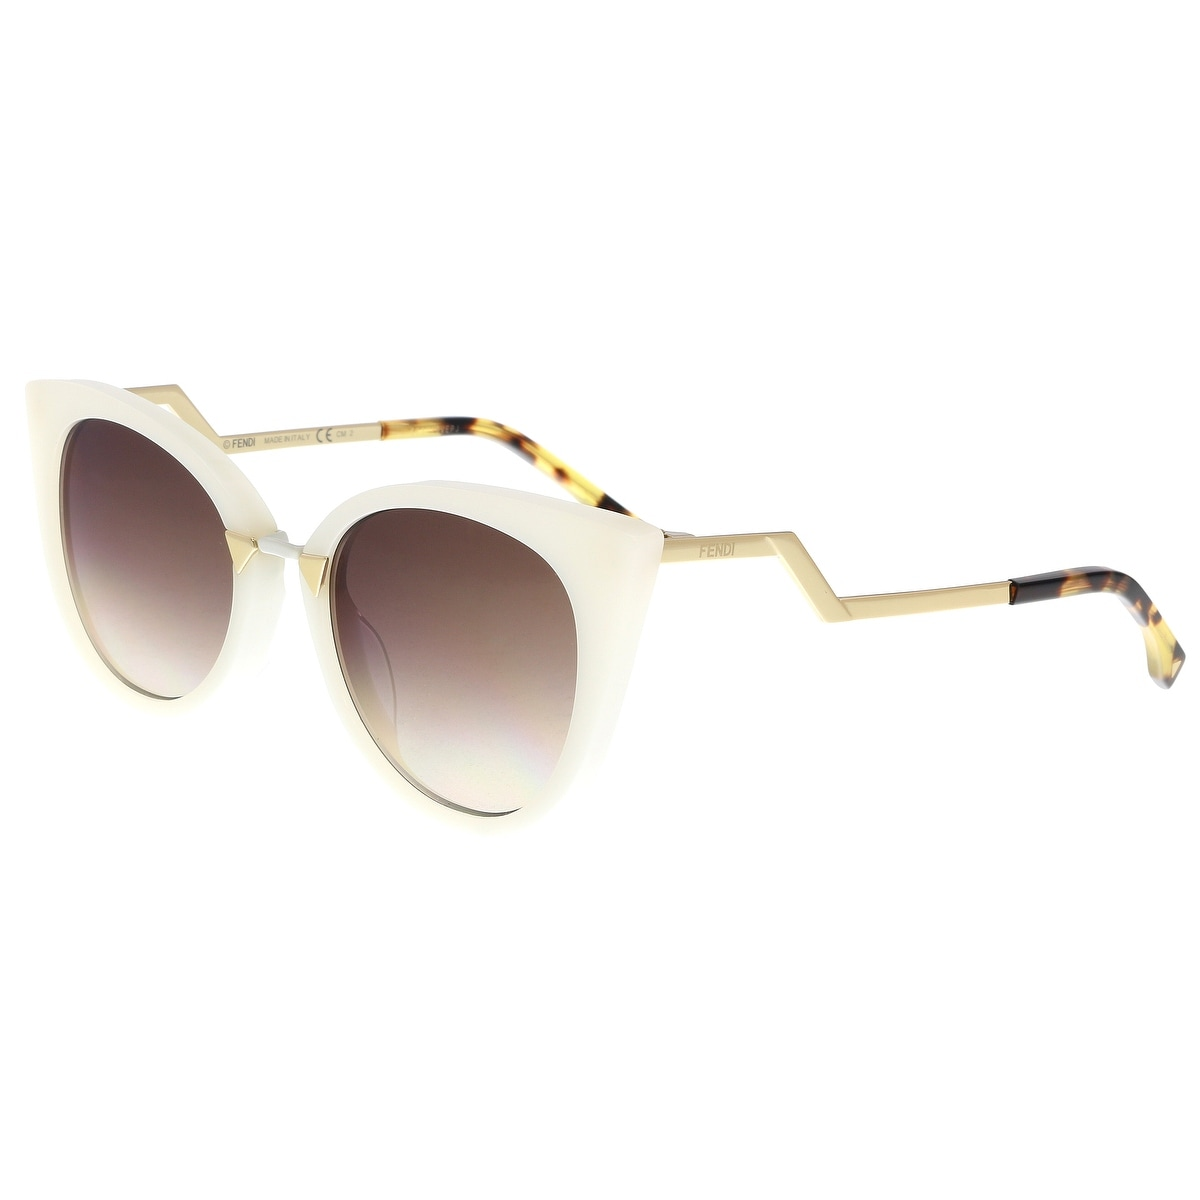 872f2808e2d0c Shop FENDI FF 0118 S 0XU3- QH Pearl white Cat eye Sunglasses - 52-20 ...